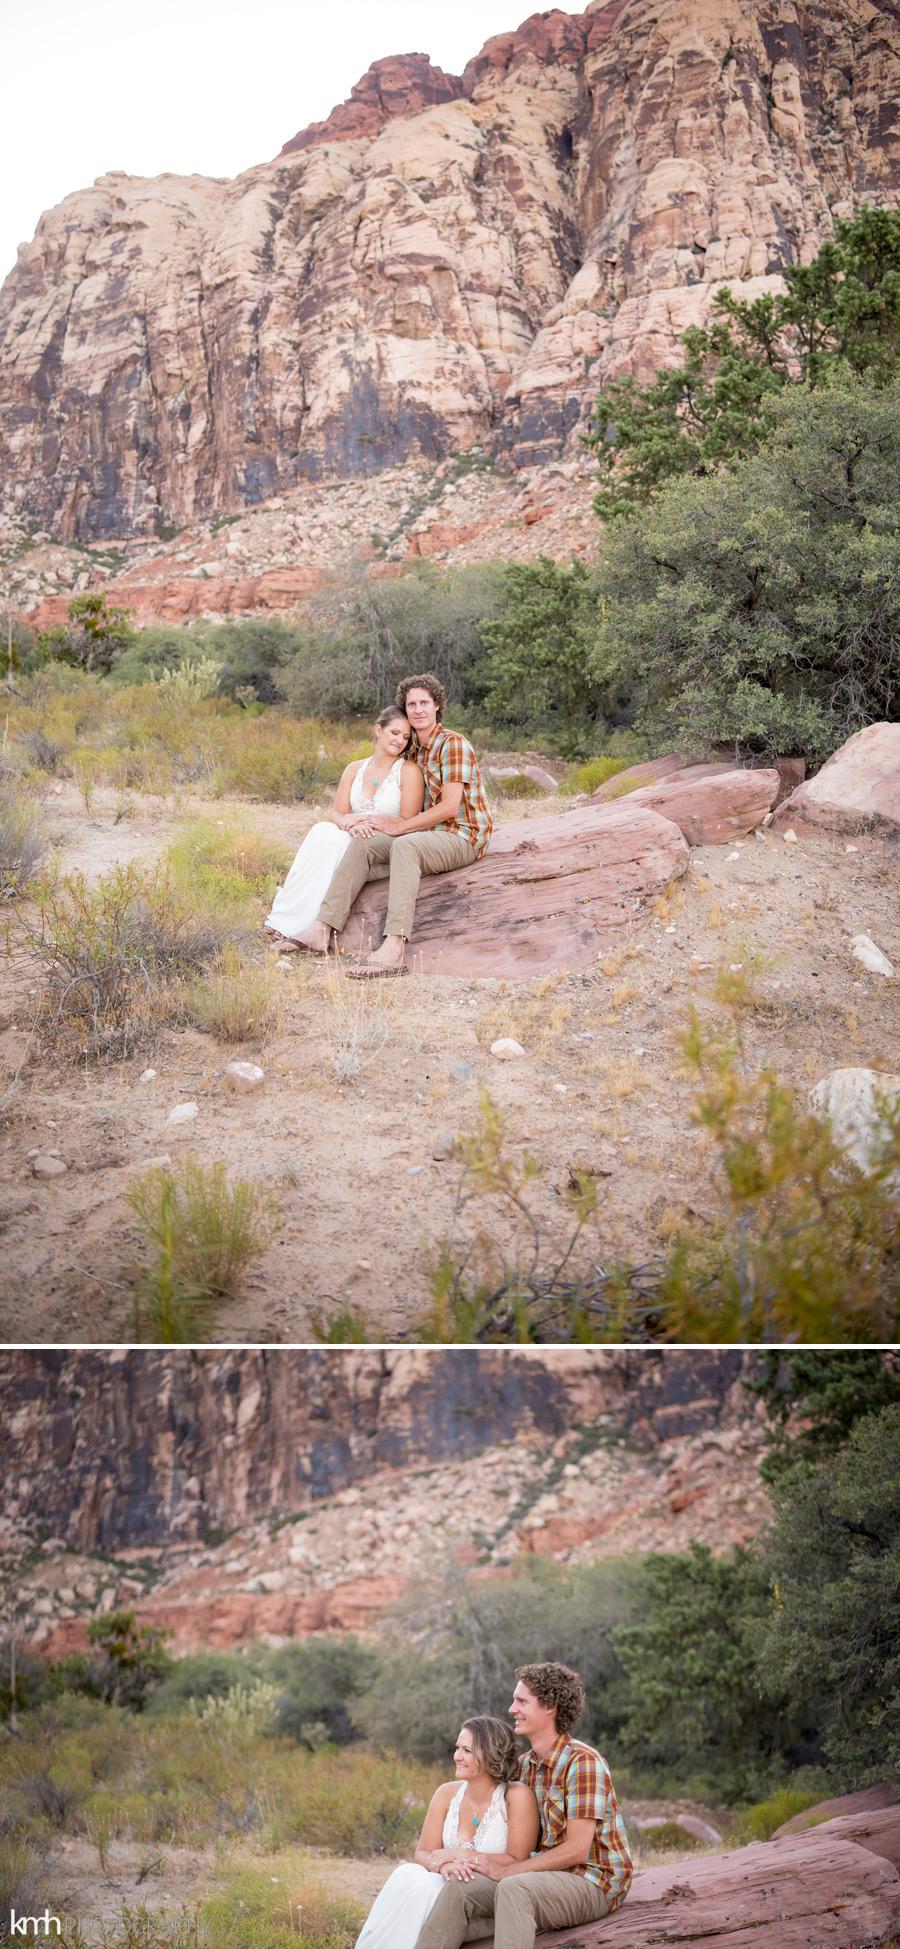 Wedding Photography Las Vegas Nevada: Kmh-photography-las-vegas-nevada-desert-elopement